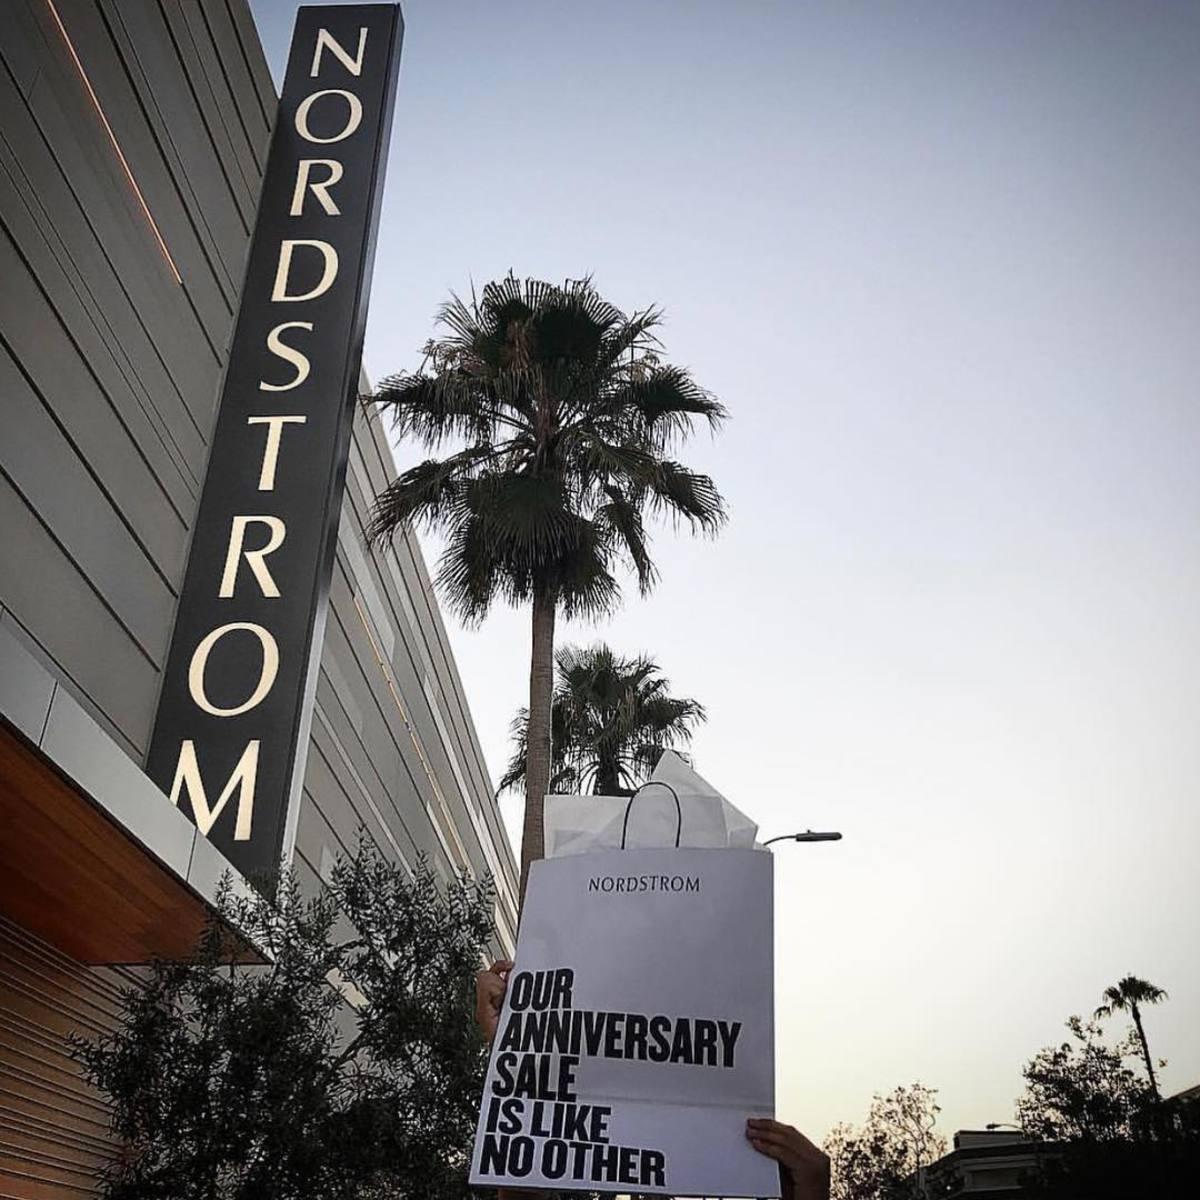 Nordstrom's Del Amo Fashion Center location in Torrance, Calif. Photo: @nordstrom/Instagram